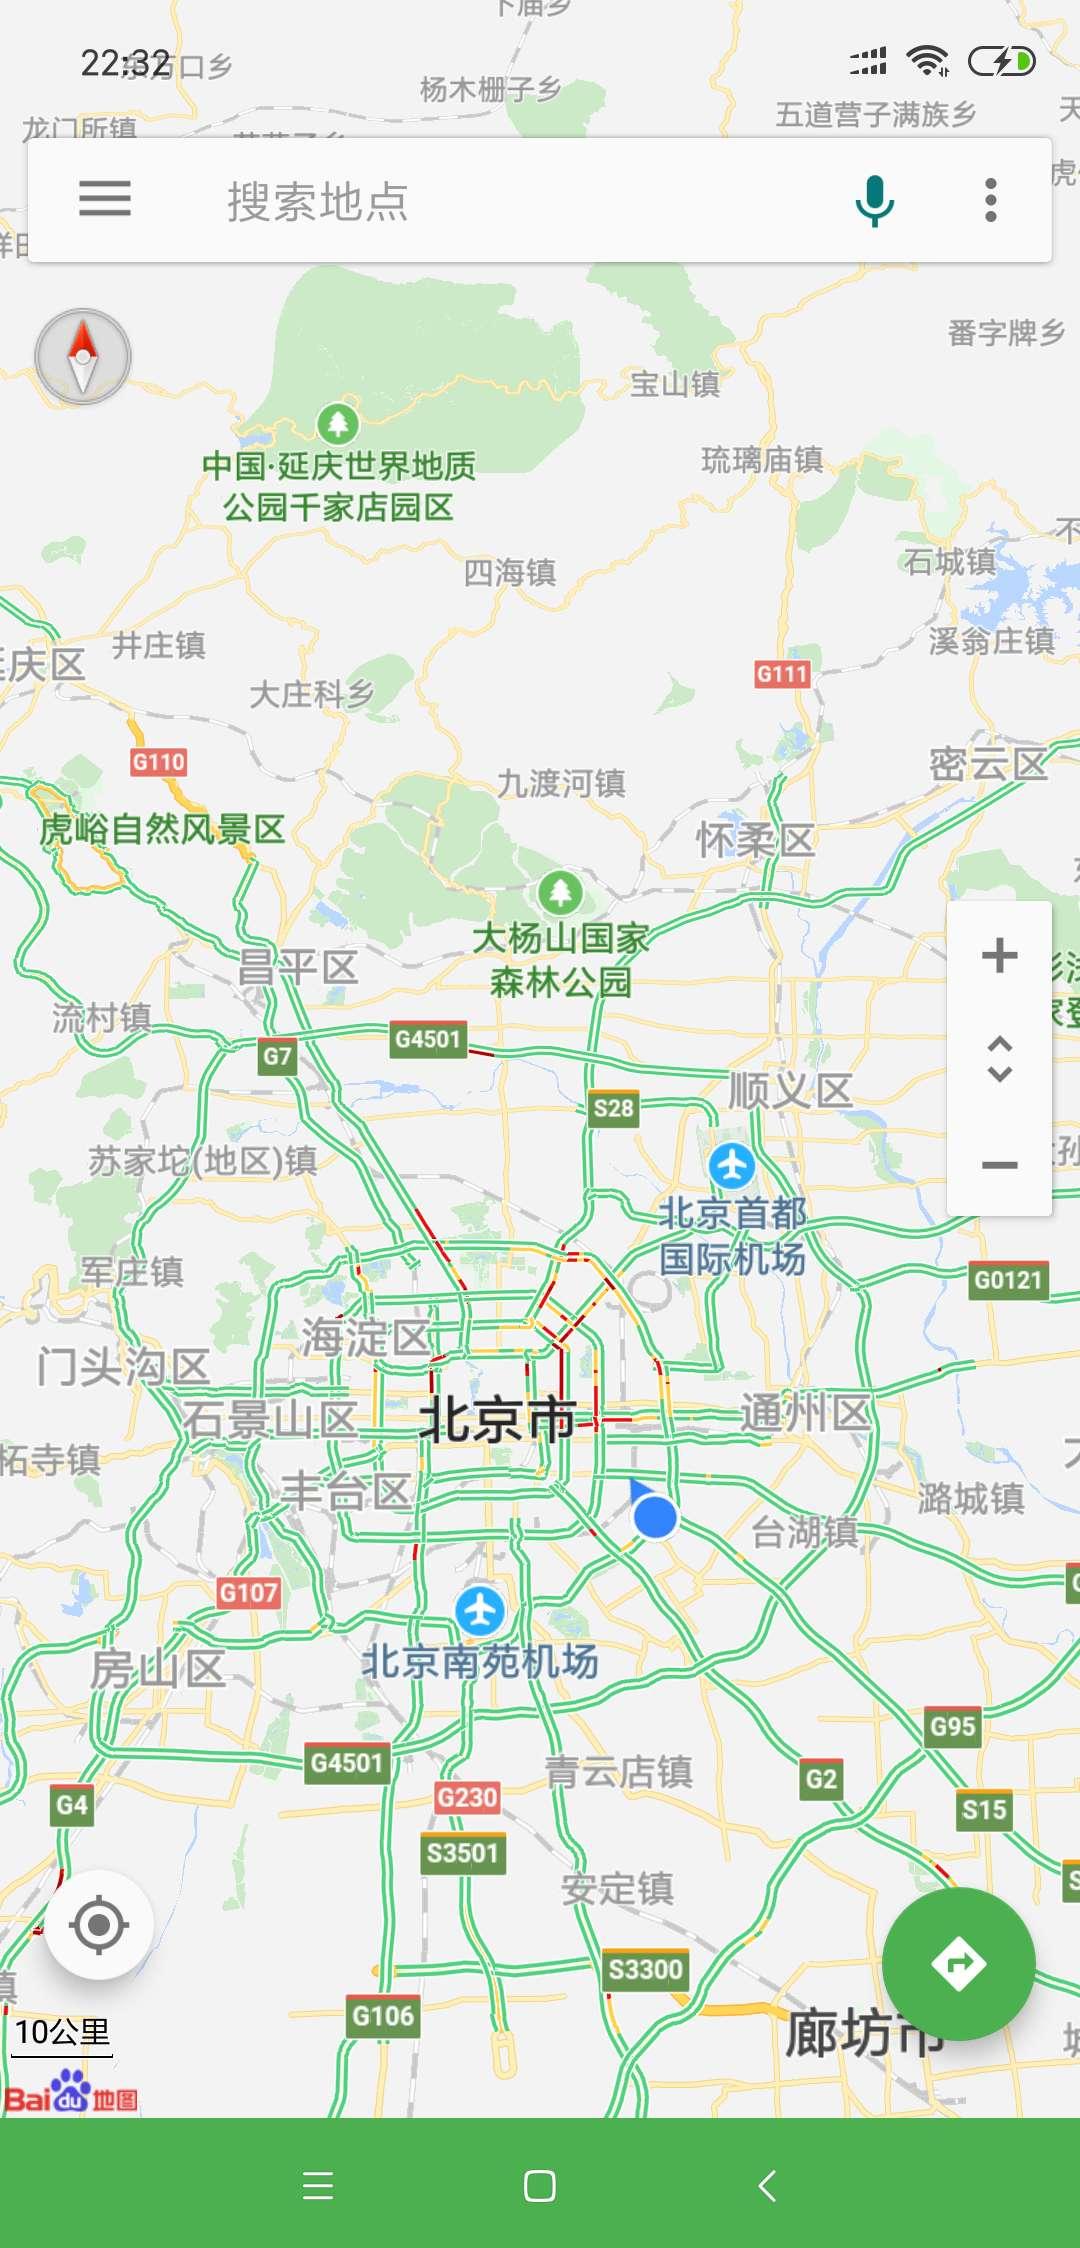 Bmap(新版本)地图